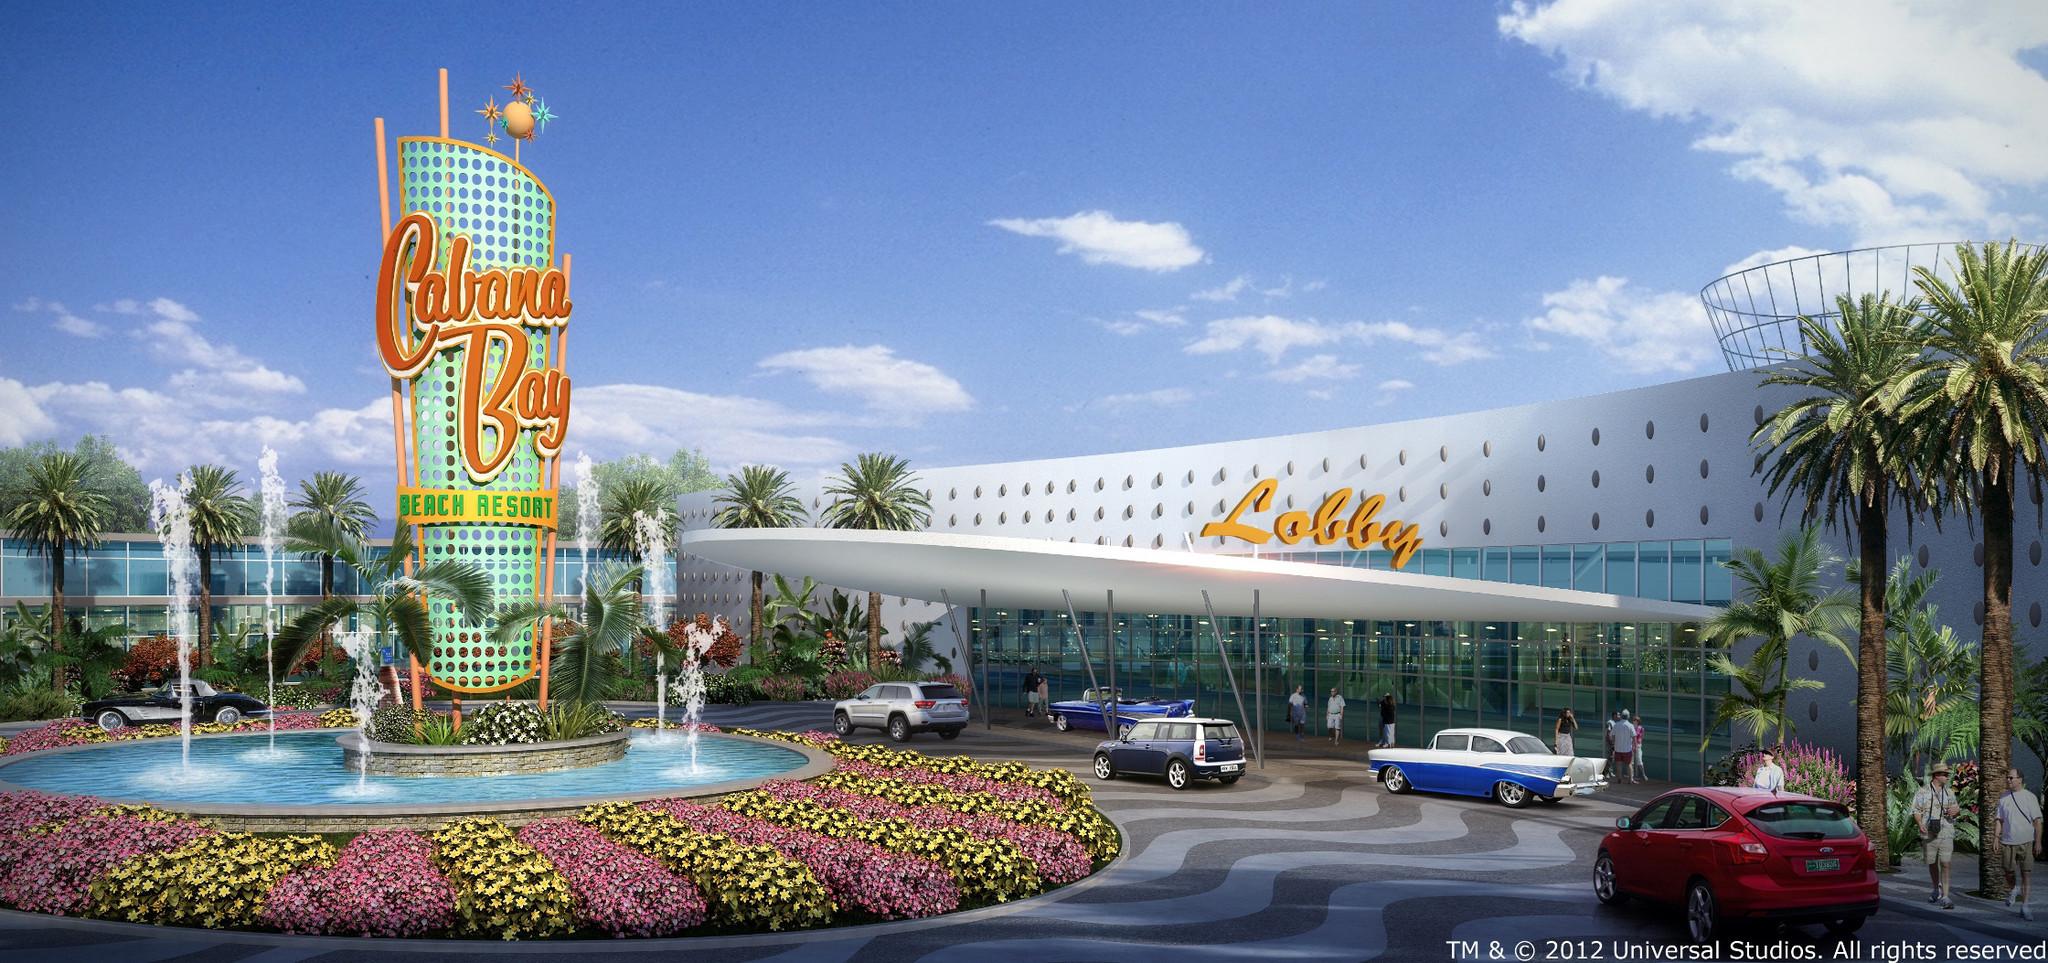 Florida Hotel Rooms Open To Beach